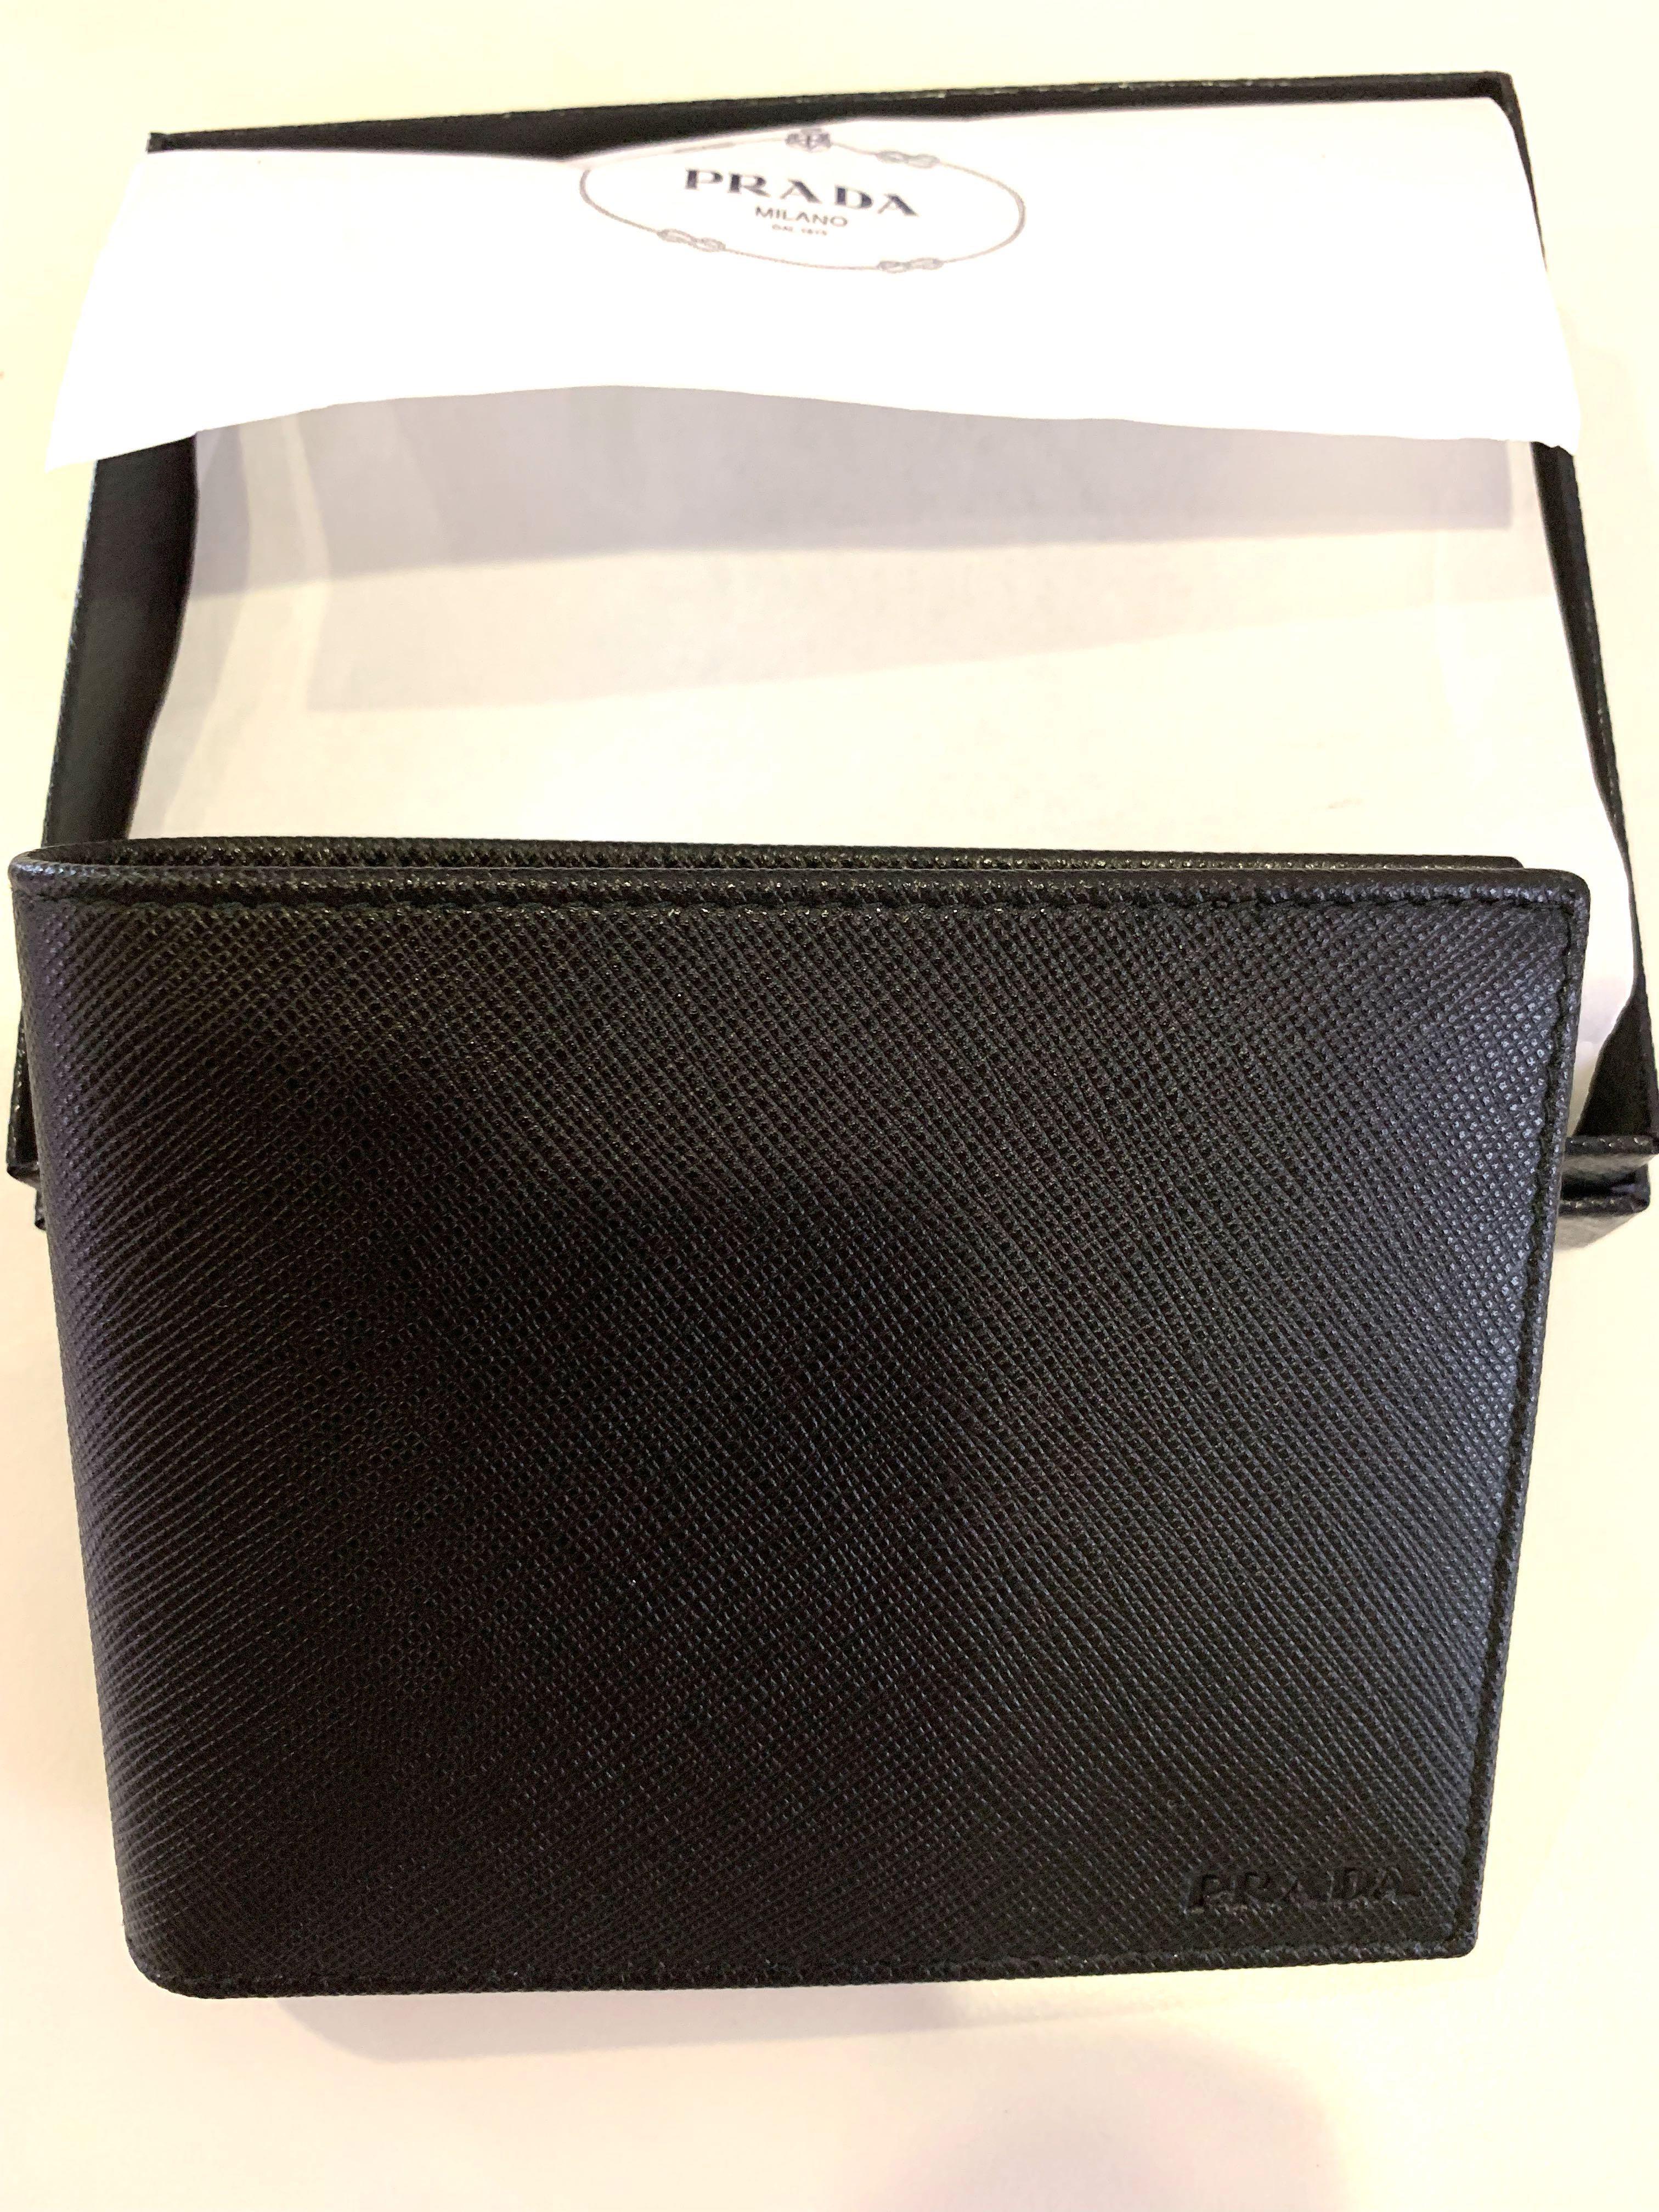 c8354ed9aebf Prada new in box men wallet black, Men's Fashion, Bags & Wallets ...